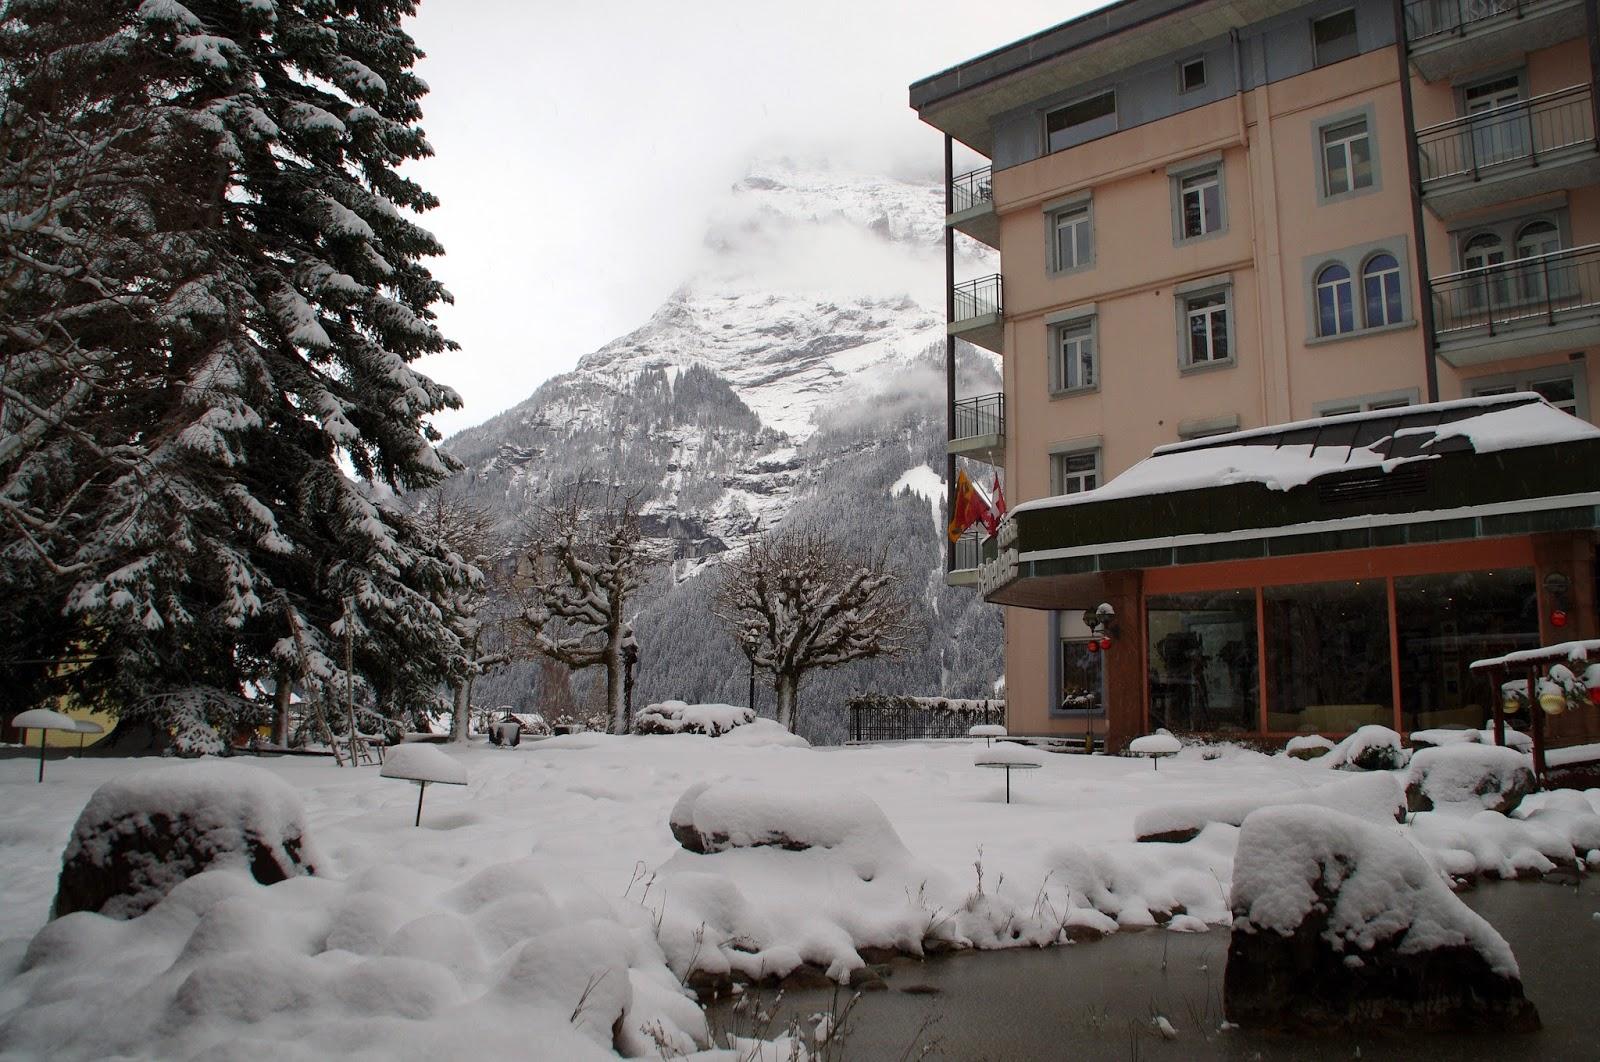 Hotel Belvedere Grindelwald Snowy Grounds